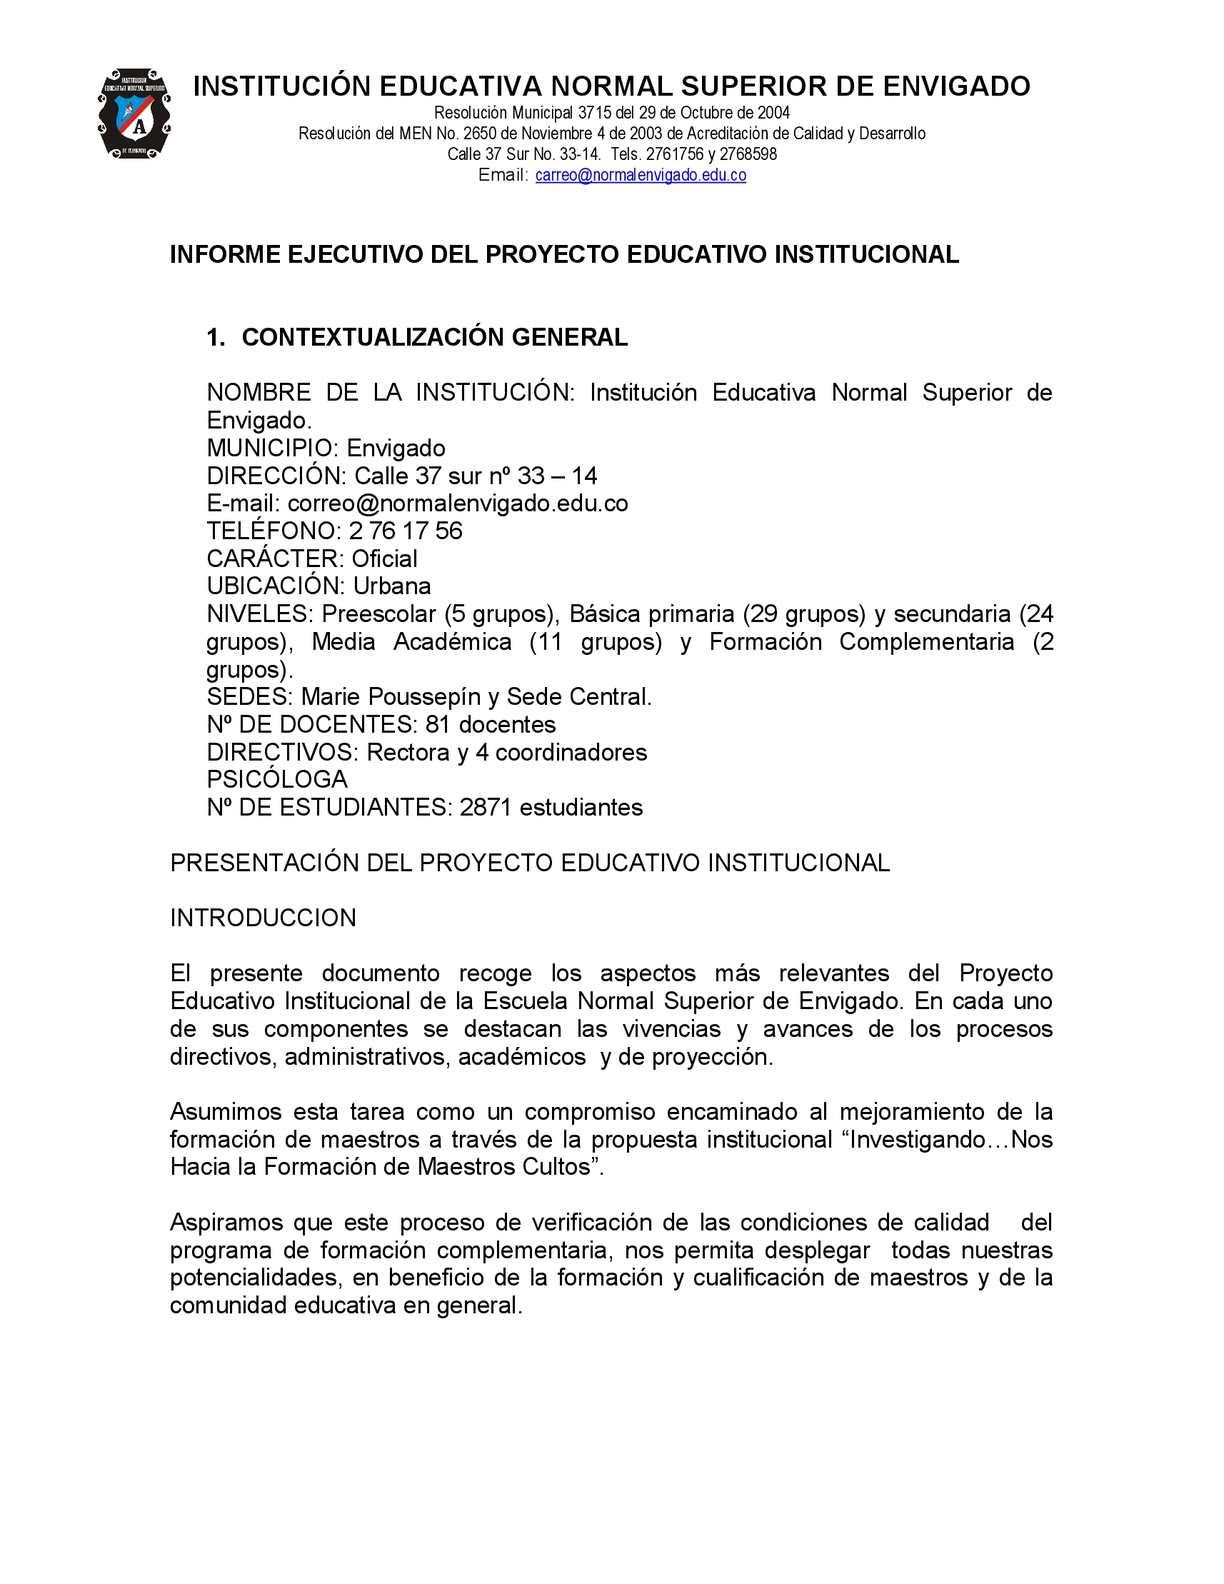 Informe Ejecutivo Del Proyecto Educativo Institucional